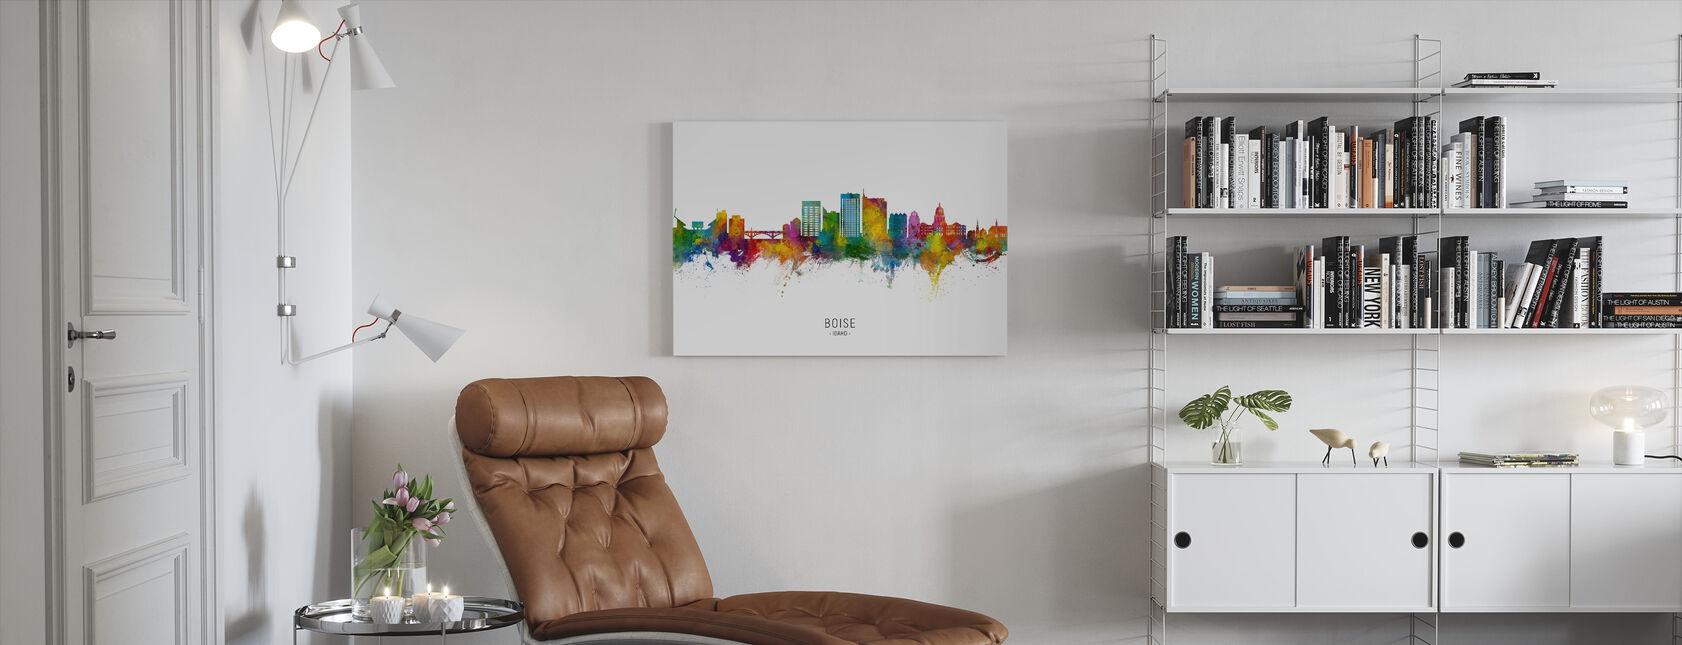 Boise Idaho Skyline - Canvas print - Living Room